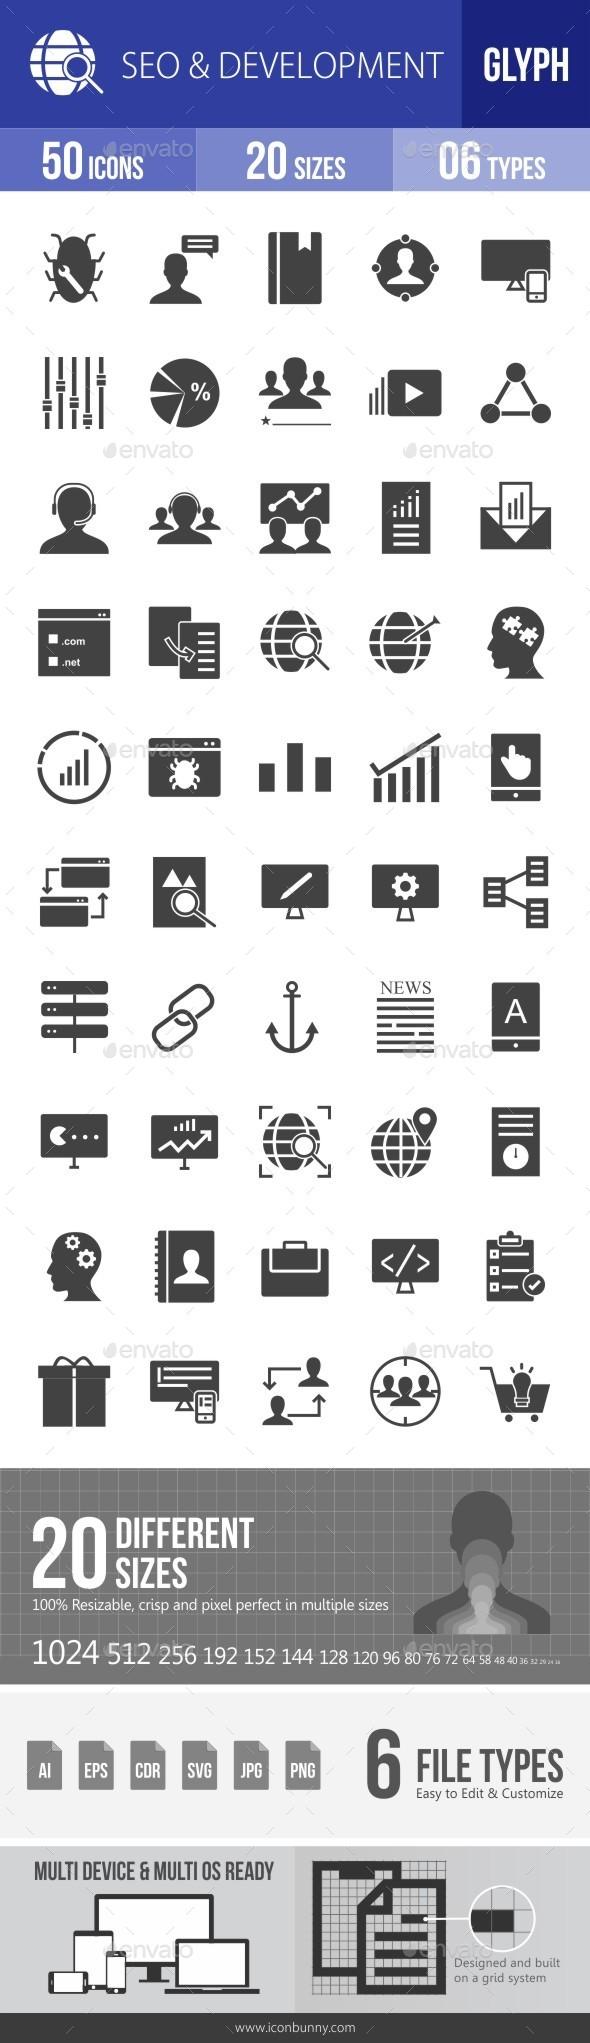 SEO & Development Services Glyph Icons - Icons